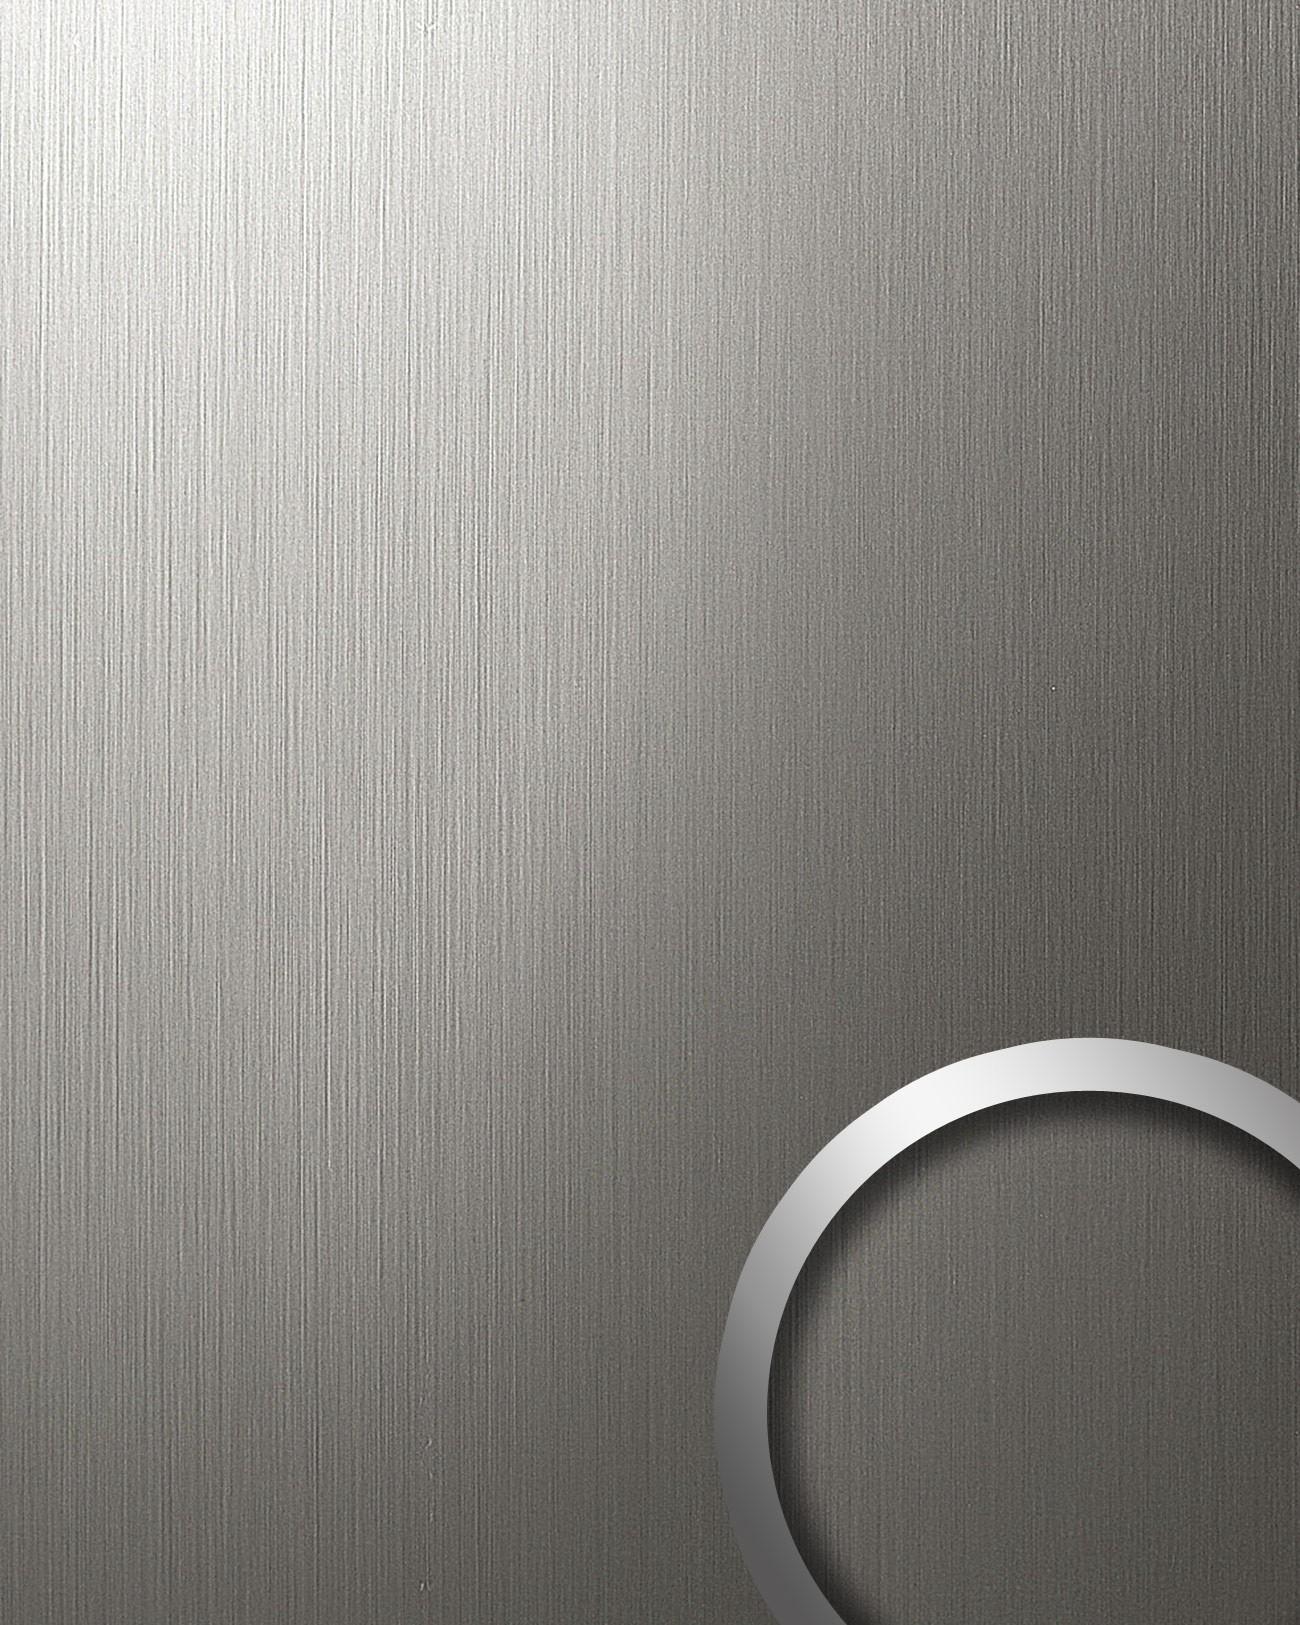 wallface 15297 deco wand paneel platte metall dekor edelstahl grau matt 2 6 qm ebay. Black Bedroom Furniture Sets. Home Design Ideas